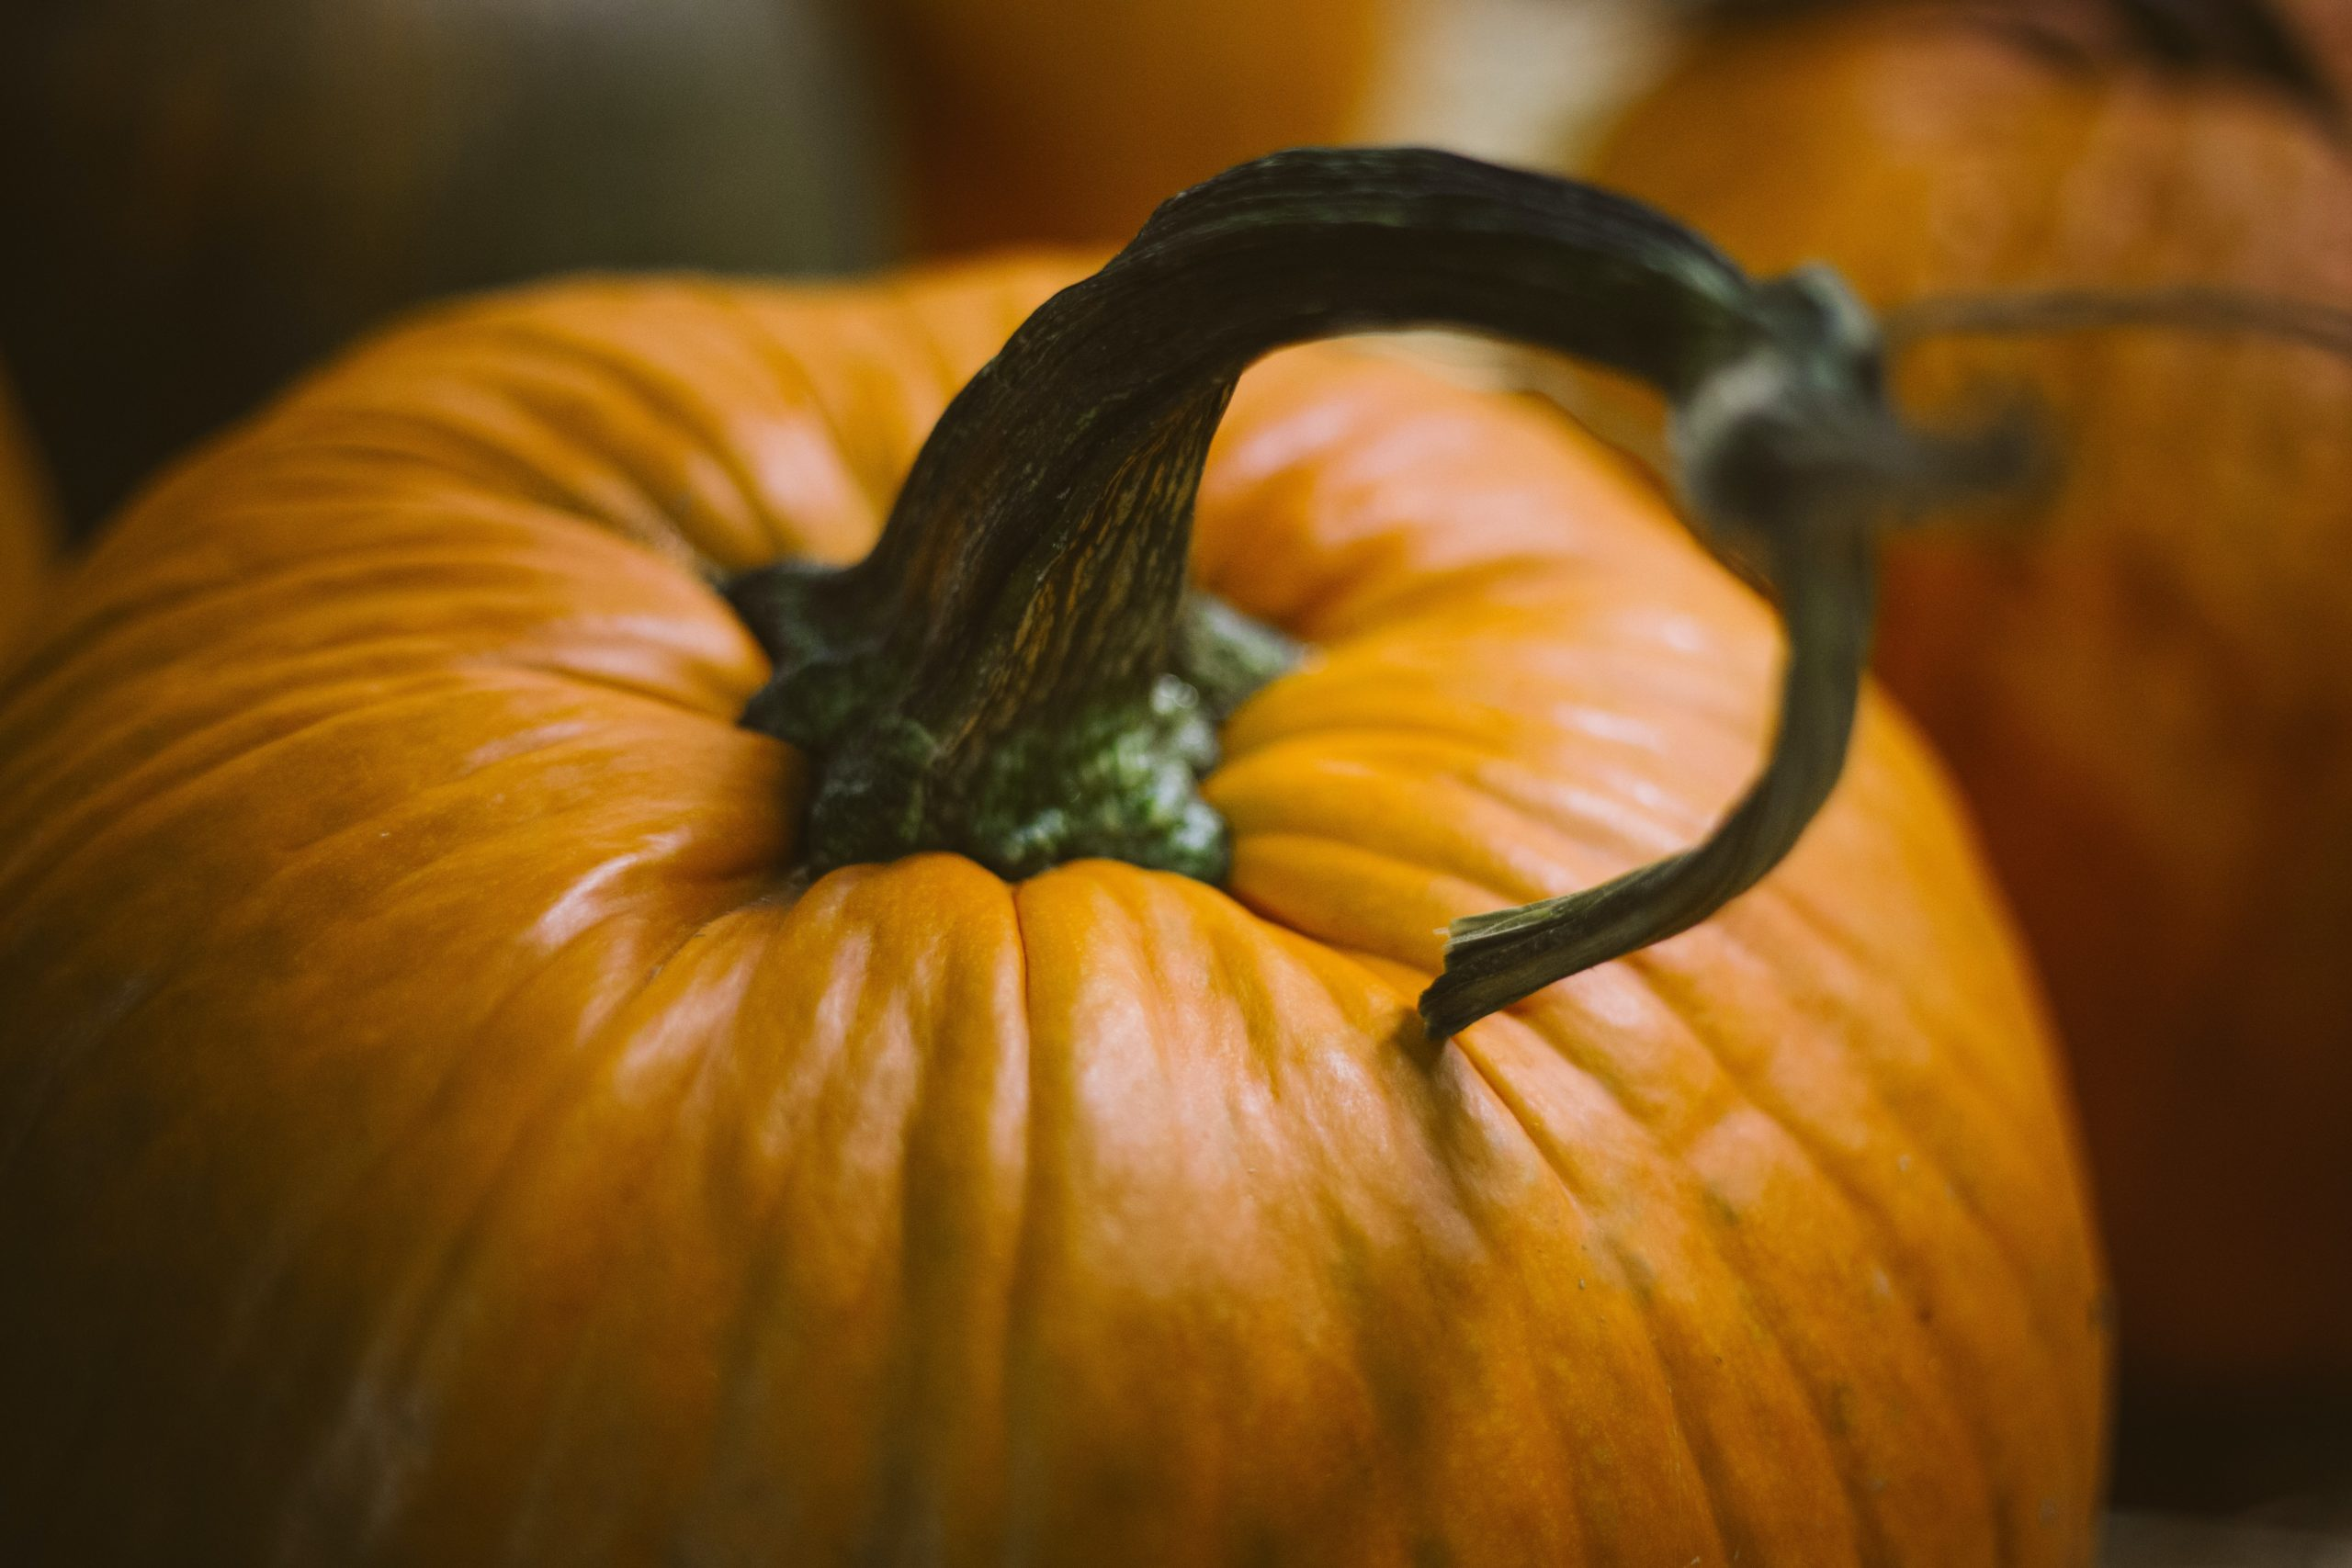 orange pumpkin with a curly stem, Thanksgiving